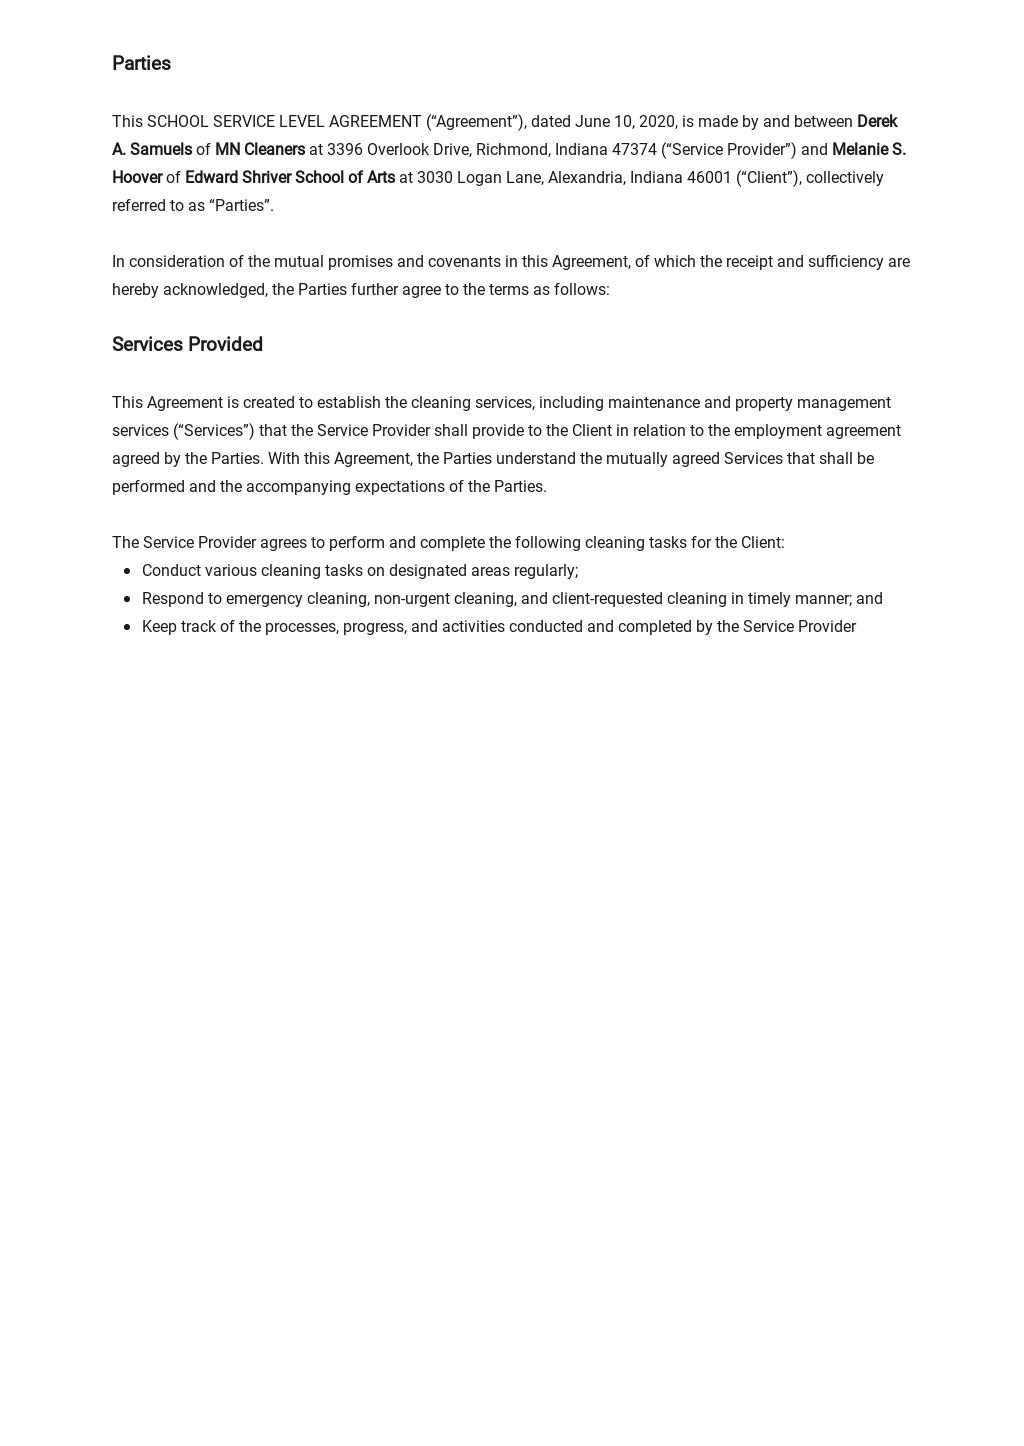 School Service Level Agreement Template 1.jpe